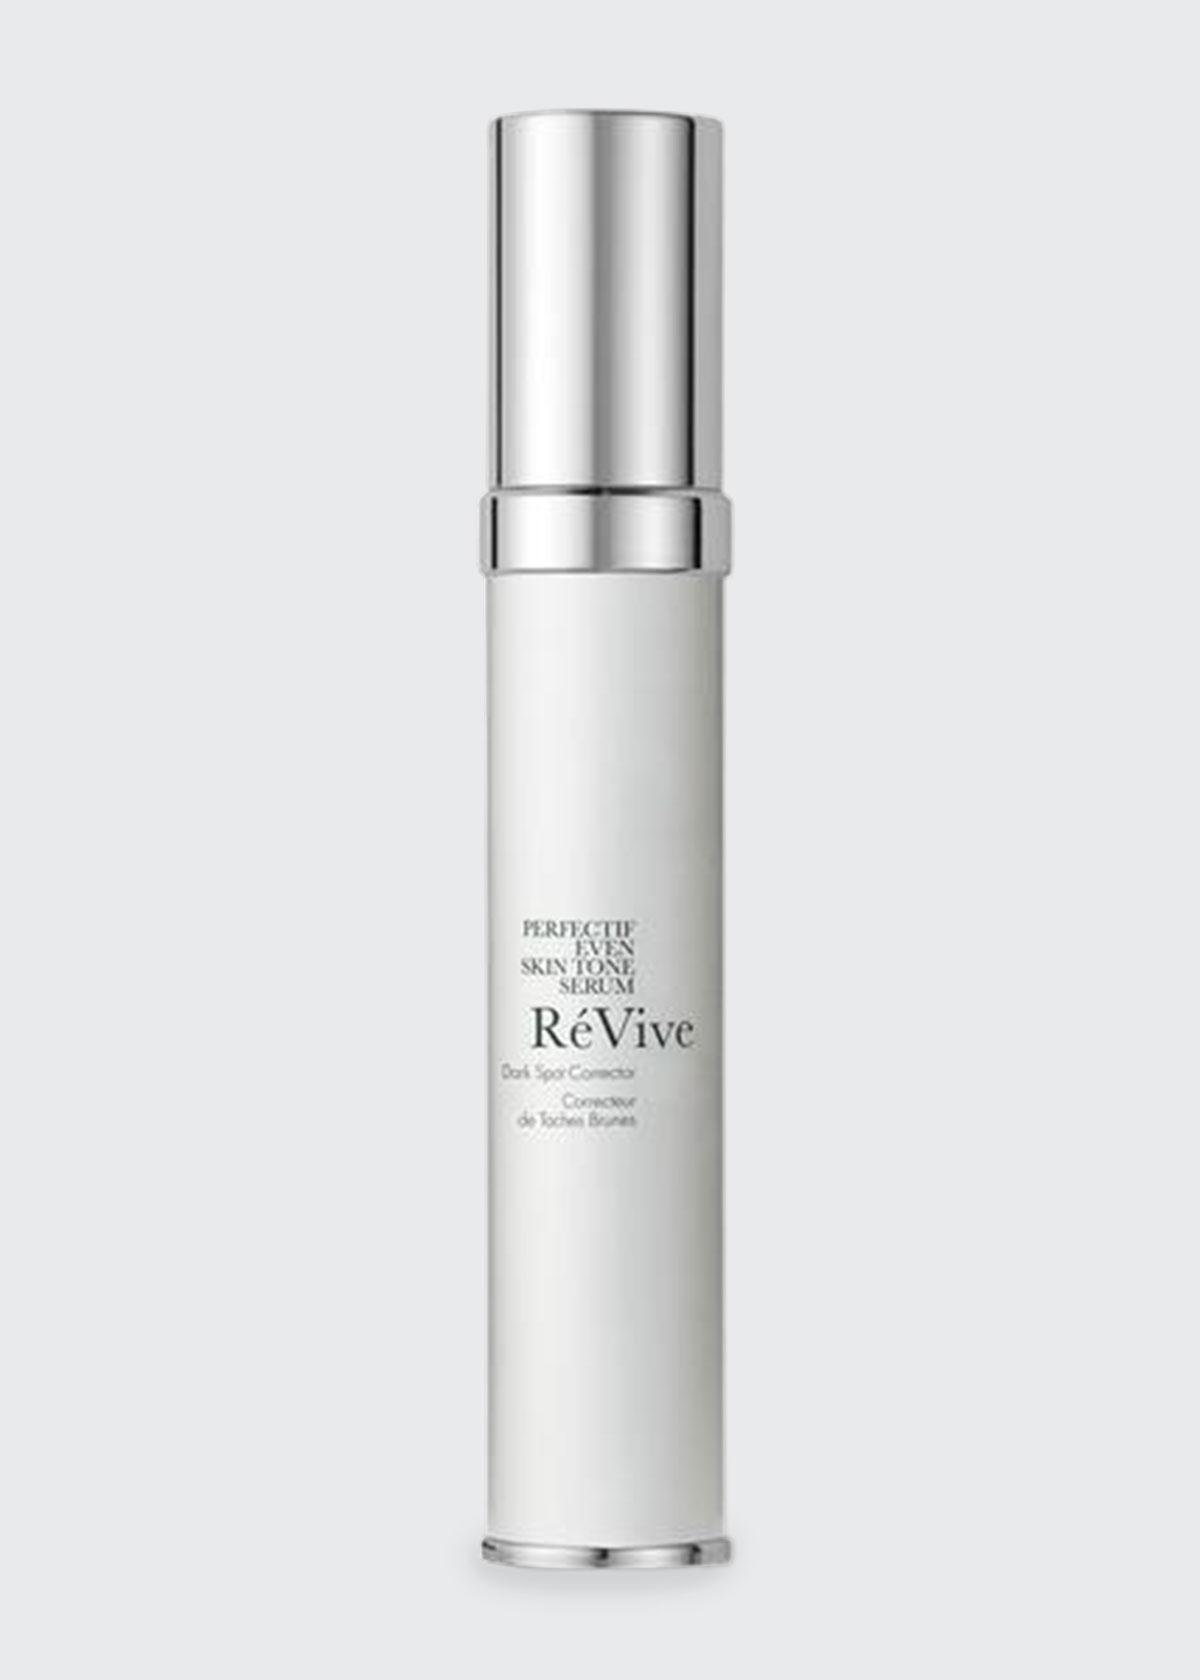 REVIVE Perfectif Even Skin Tone Serum Dark Spot Corrector, 1.0 Oz.